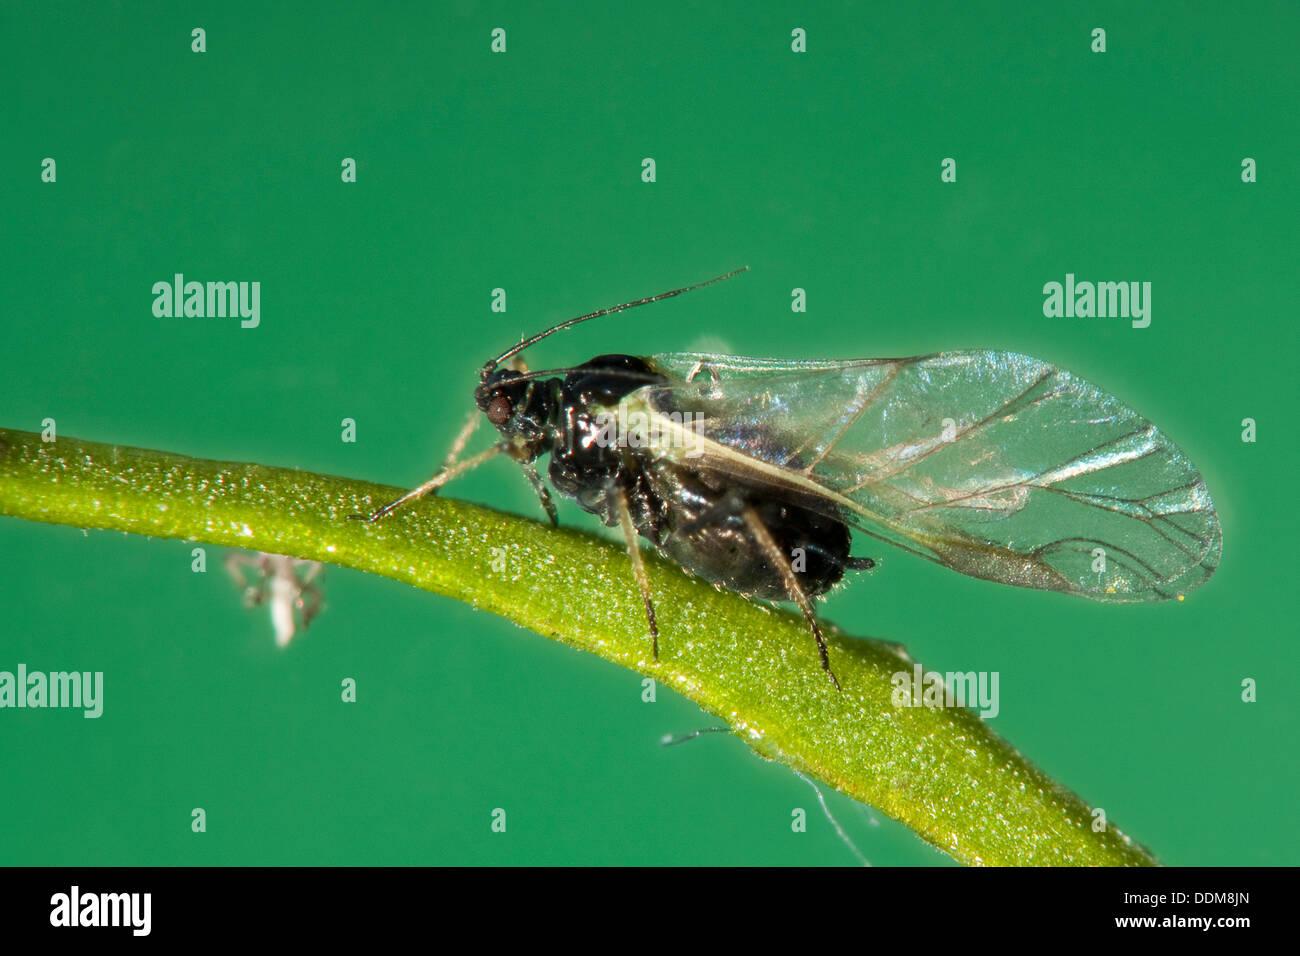 blackfly black bean aphid beet leaf aphid blattlaus. Black Bedroom Furniture Sets. Home Design Ideas